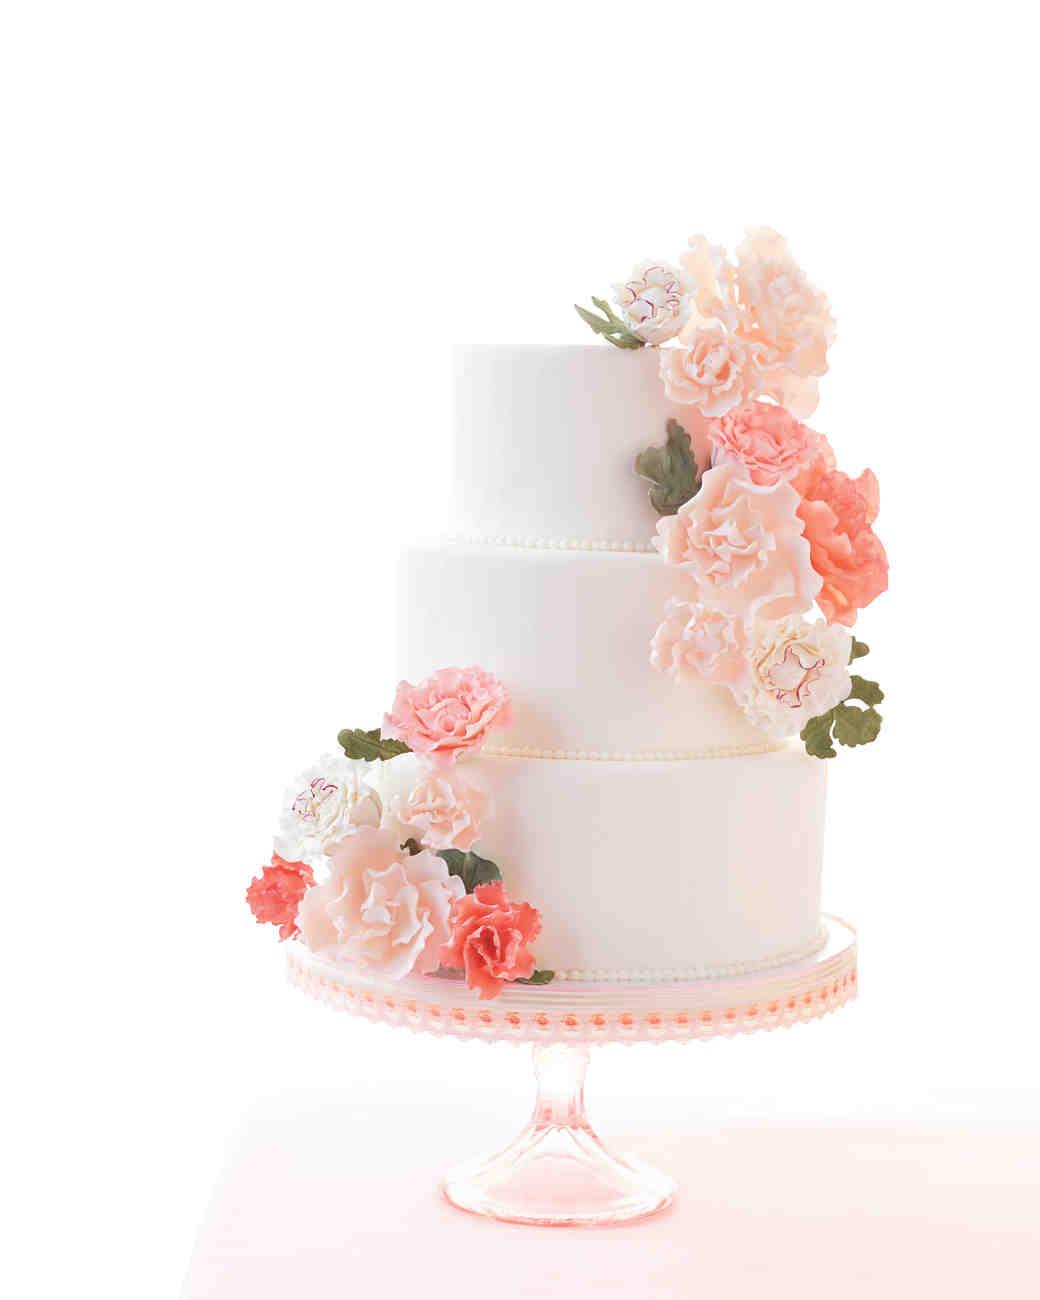 cake-155-comp-mwd110687.jpg